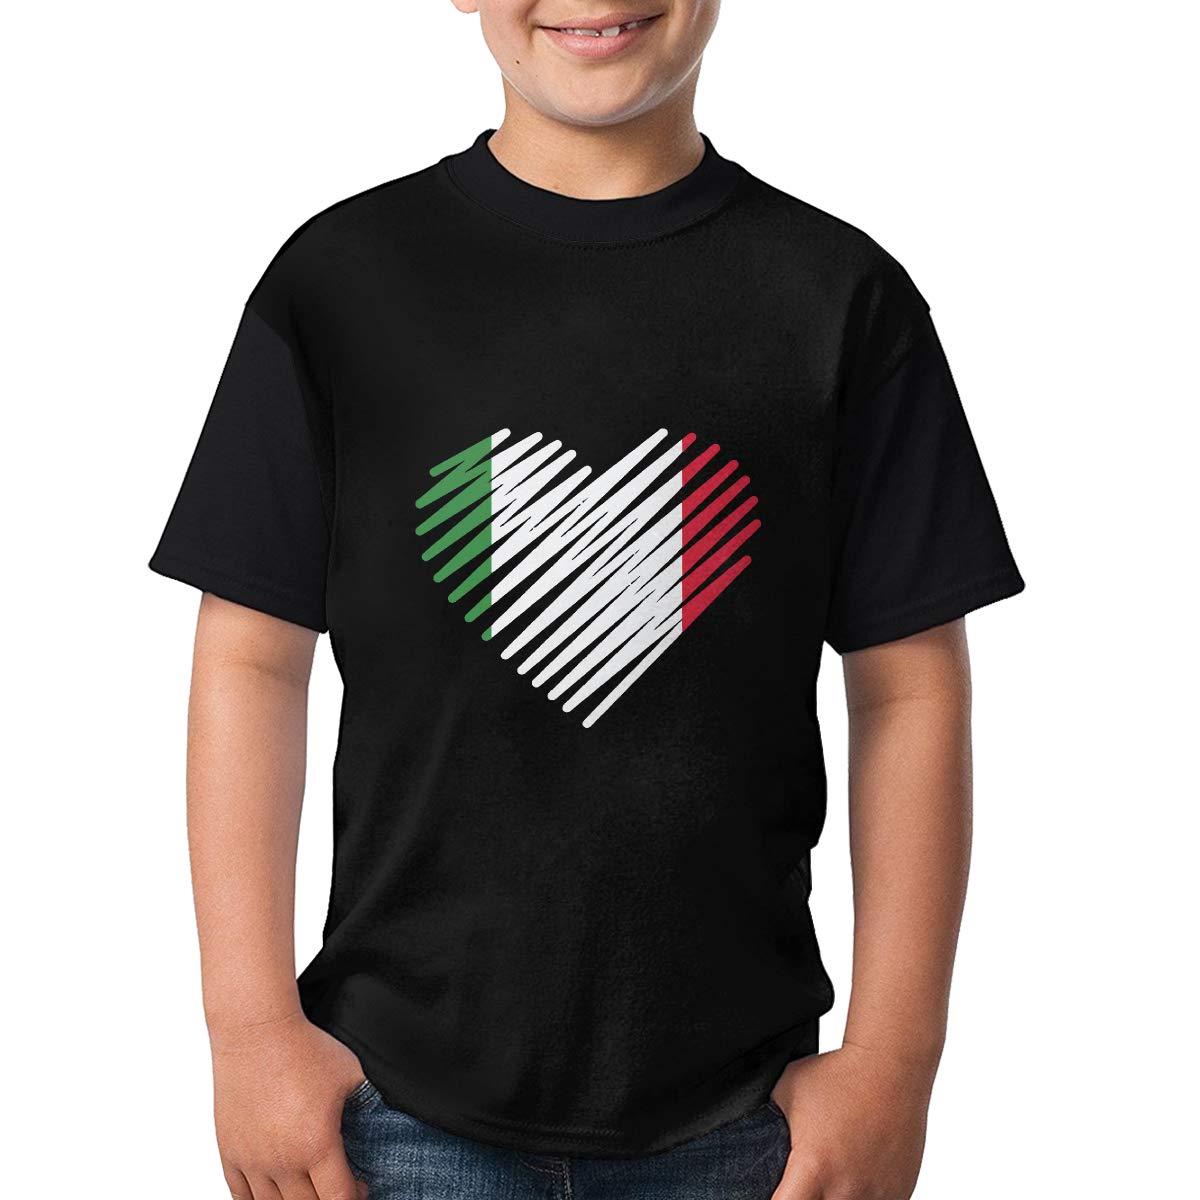 Love Italy Heart Short Sleeve Tee Funny Crew Neck Tee for Teenagers